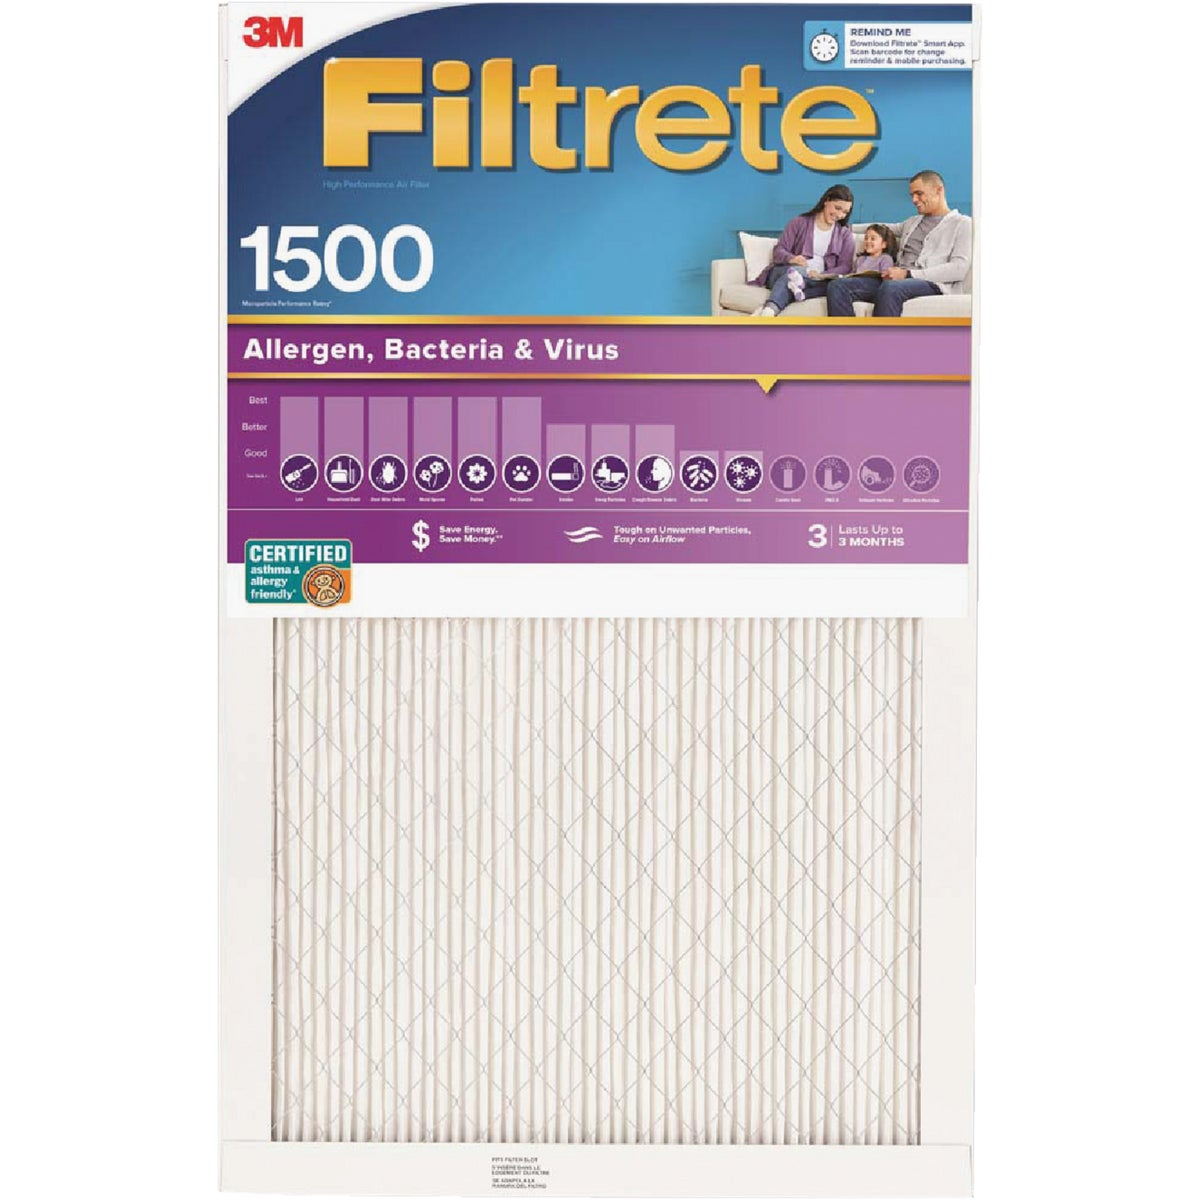 3M Filtrete 14 In. x 25 In. x 1 In. Ultra Allergen Healthy Living 1550 MPR Furnace Filter